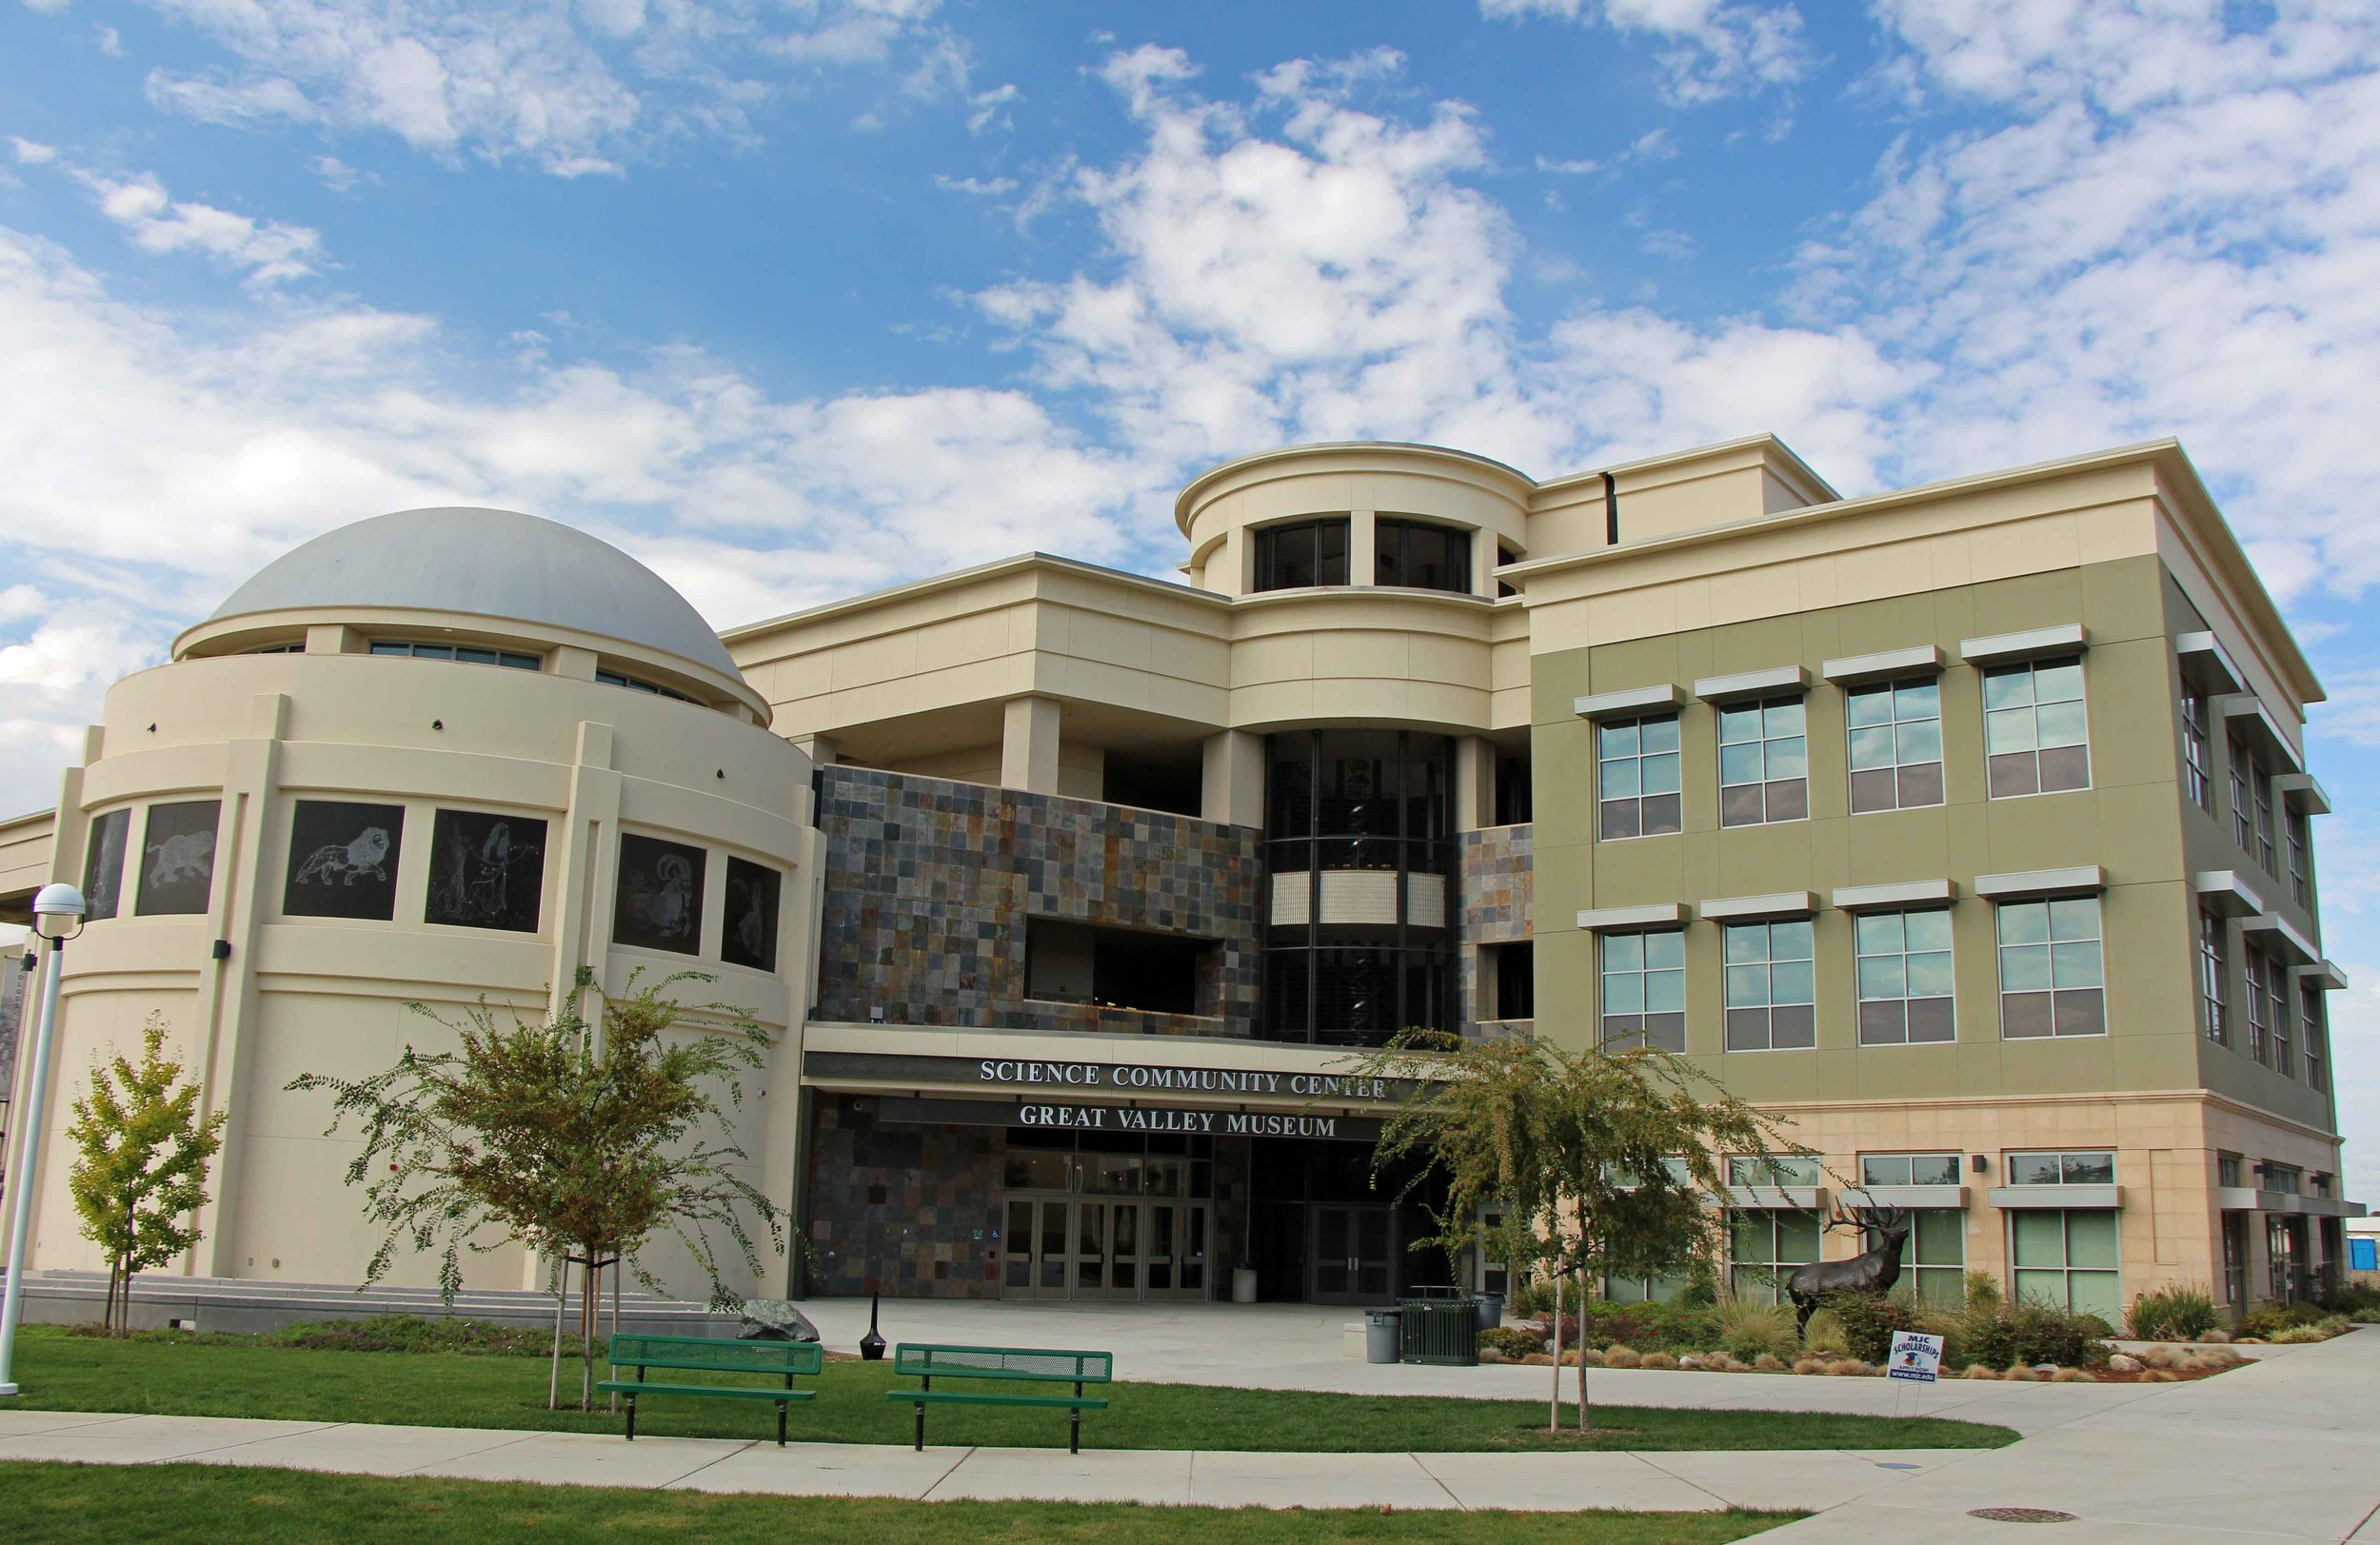 Science Community Center Building.JPG